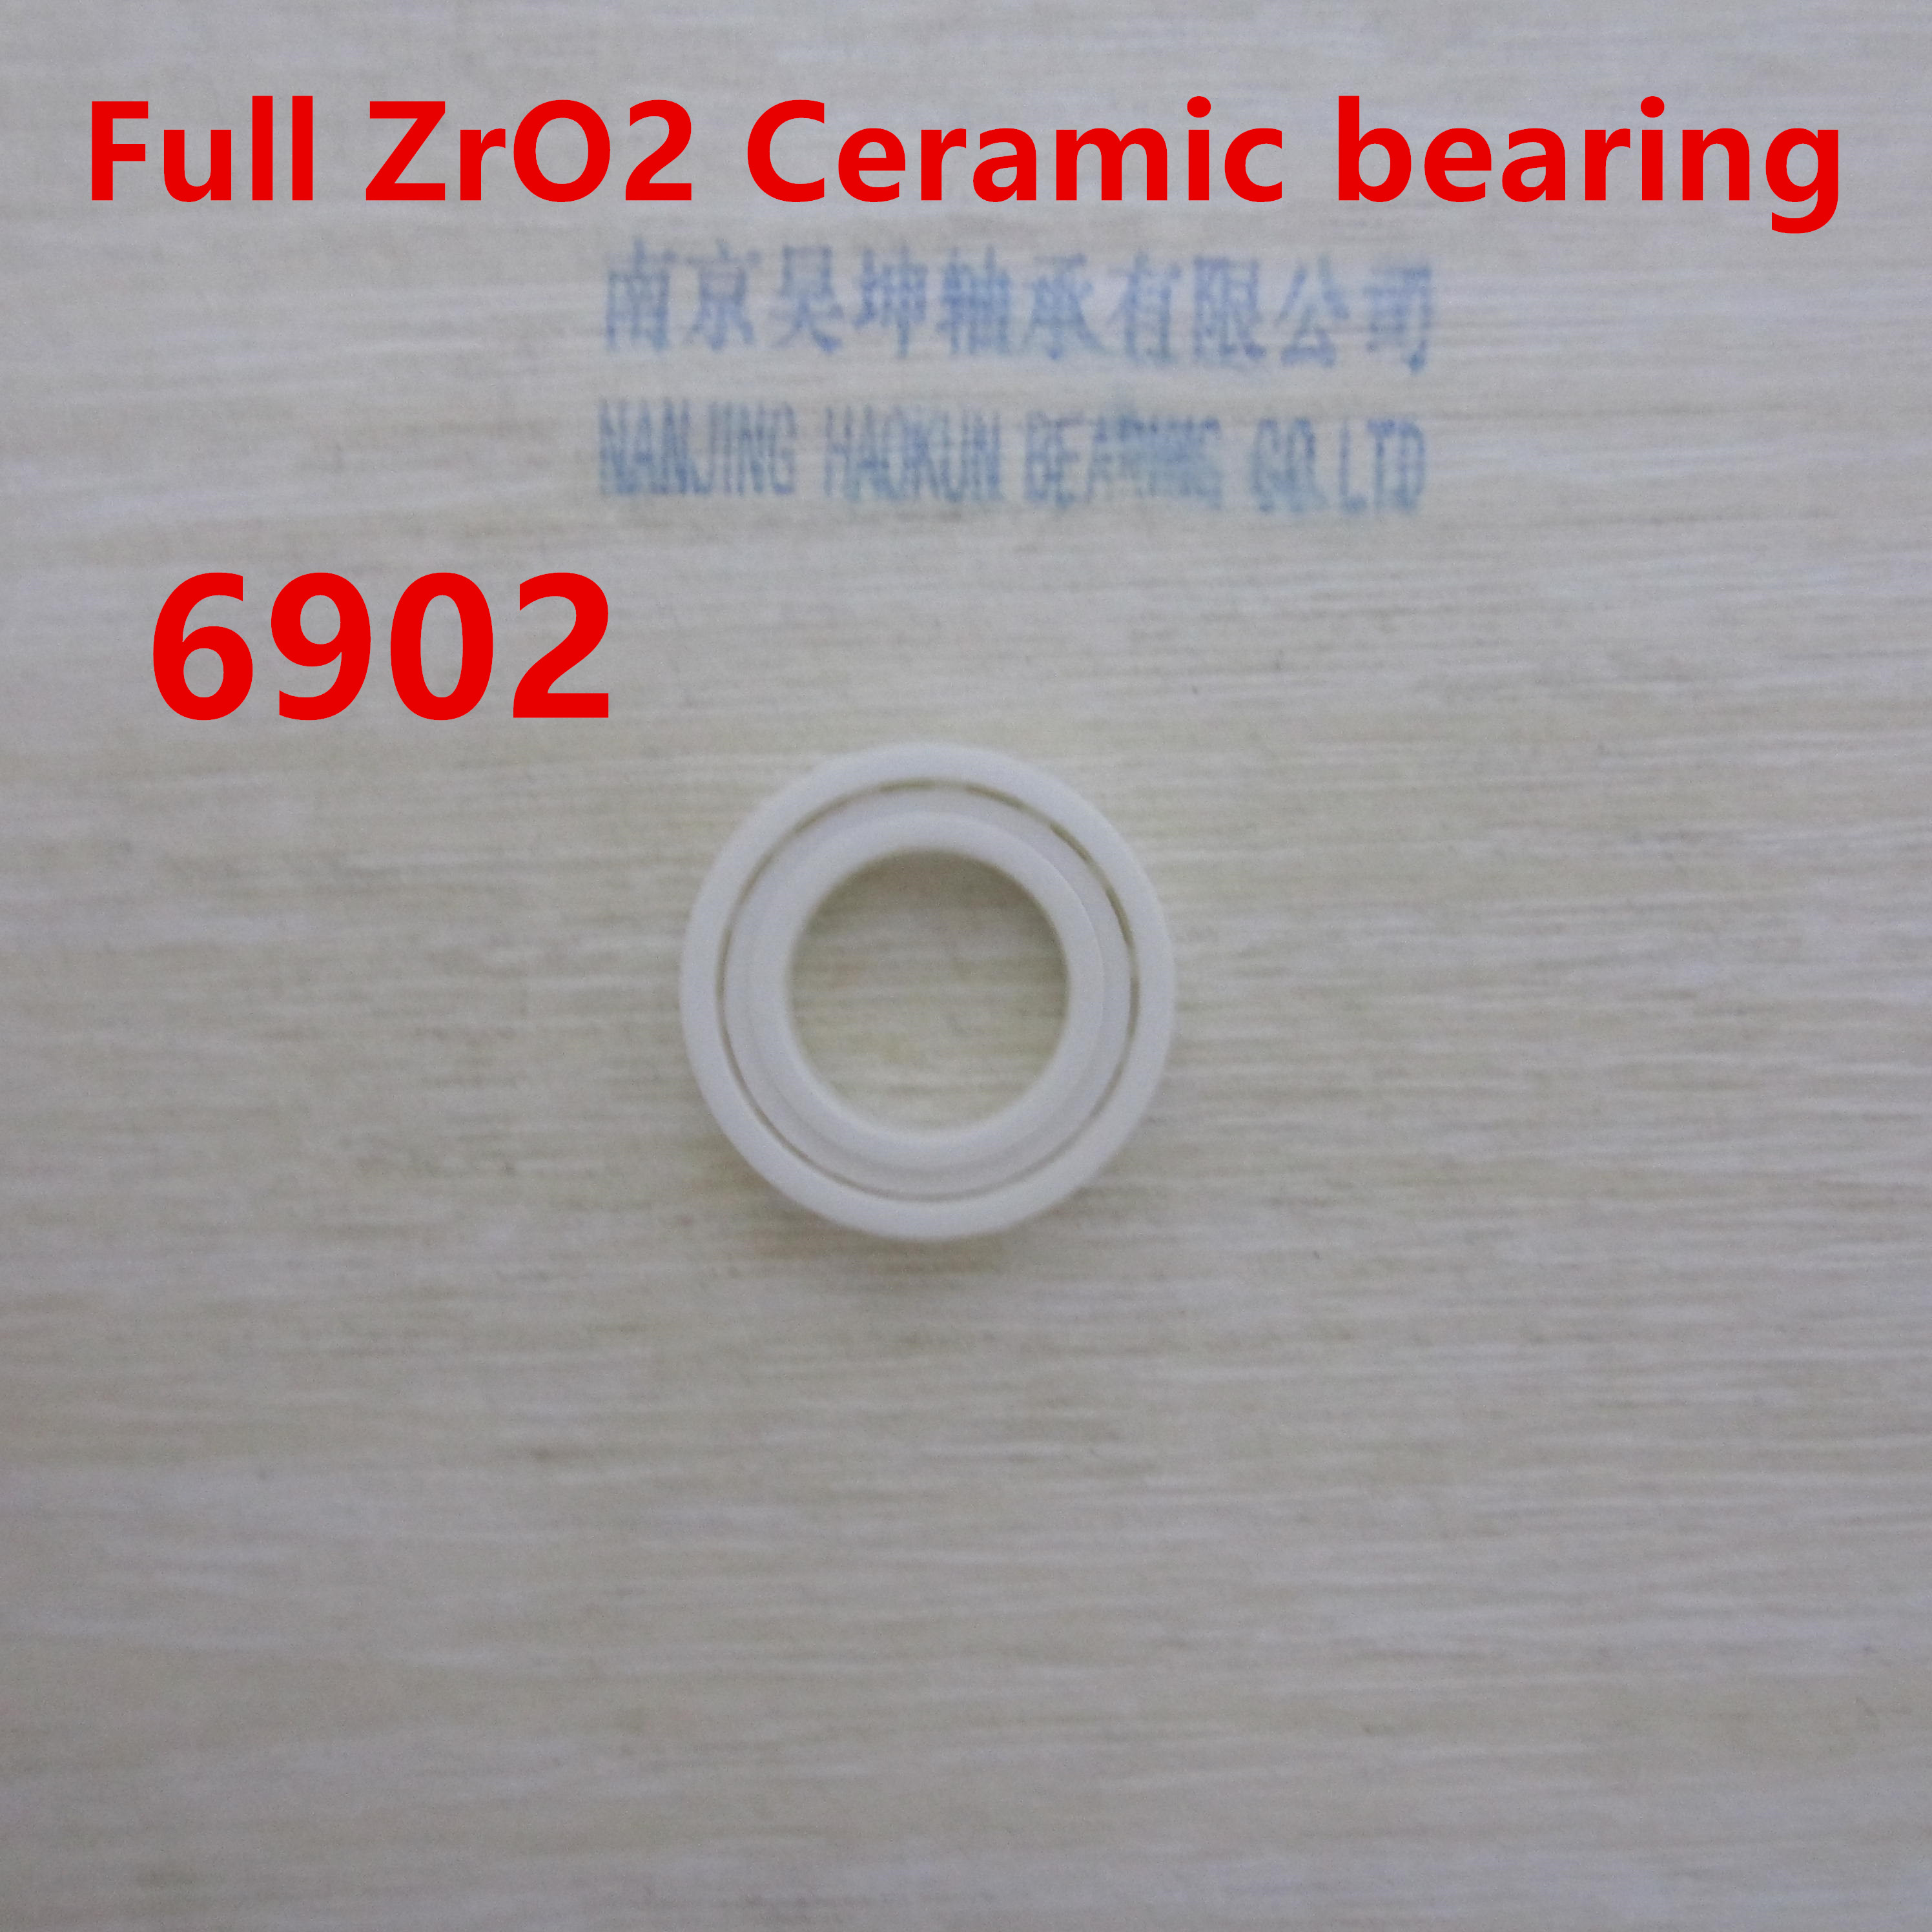 ceramic bearing 61902 ZRO2 ceramic bearing 15*28*7mm 6902 ceramic wheel hub bearing zro2 15267 15 26 7mm 15267 full zro2 ceramic bearing